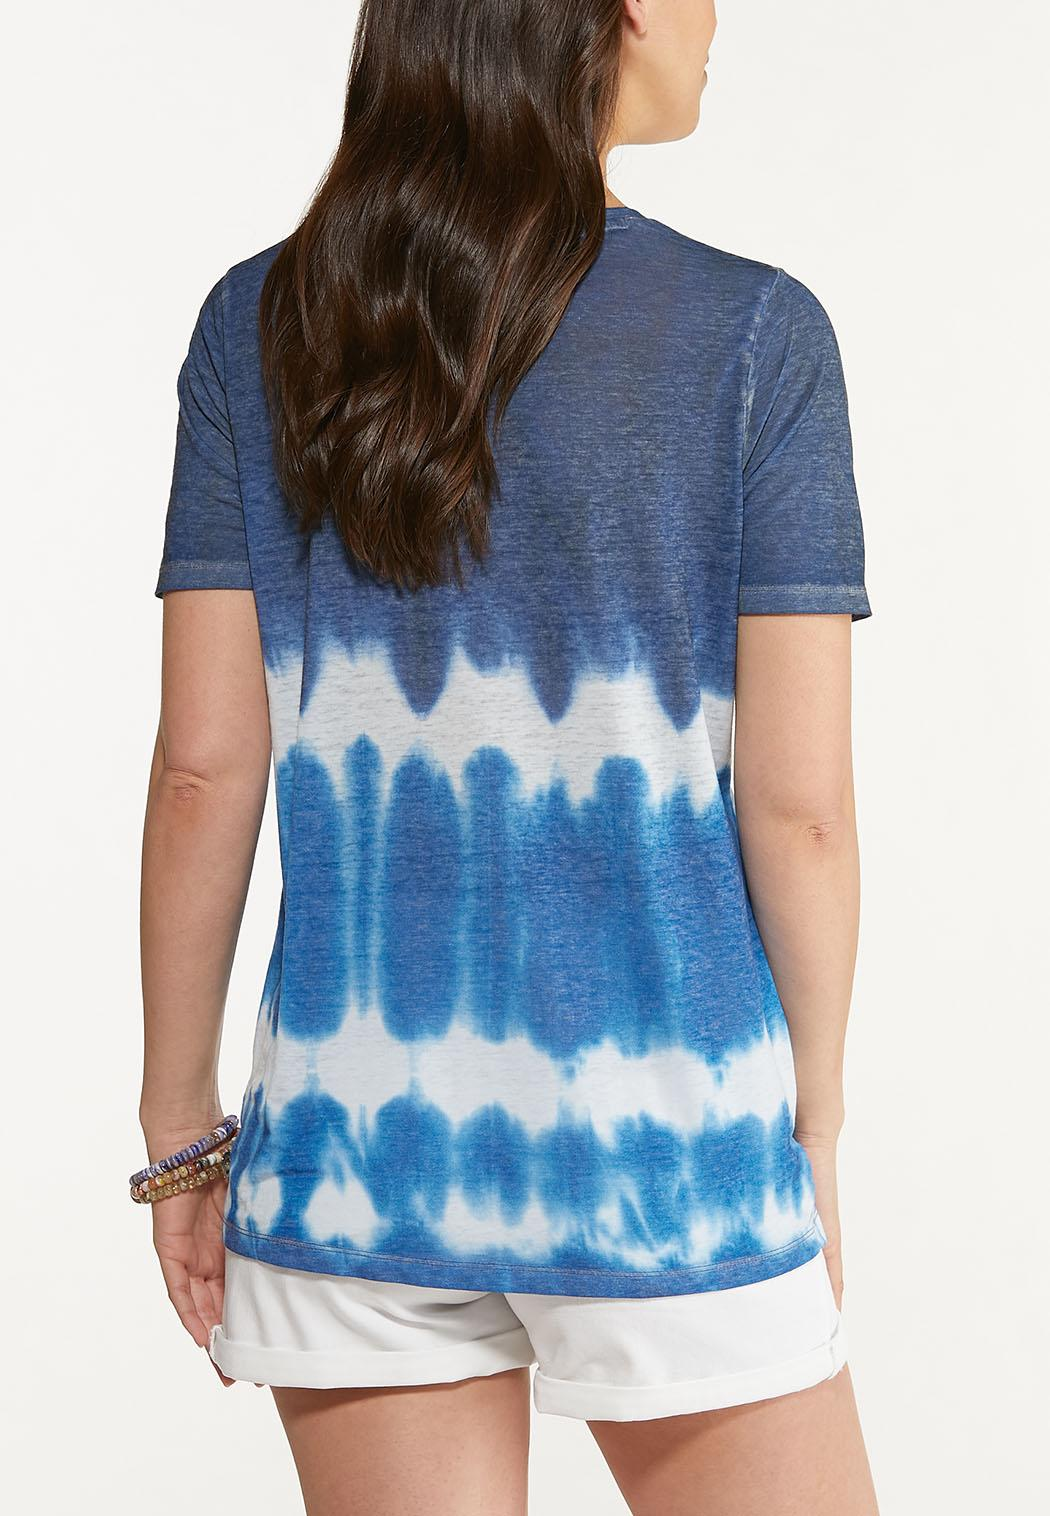 Plus Size Tie Dye V-Neck Tee (Item #44624282)